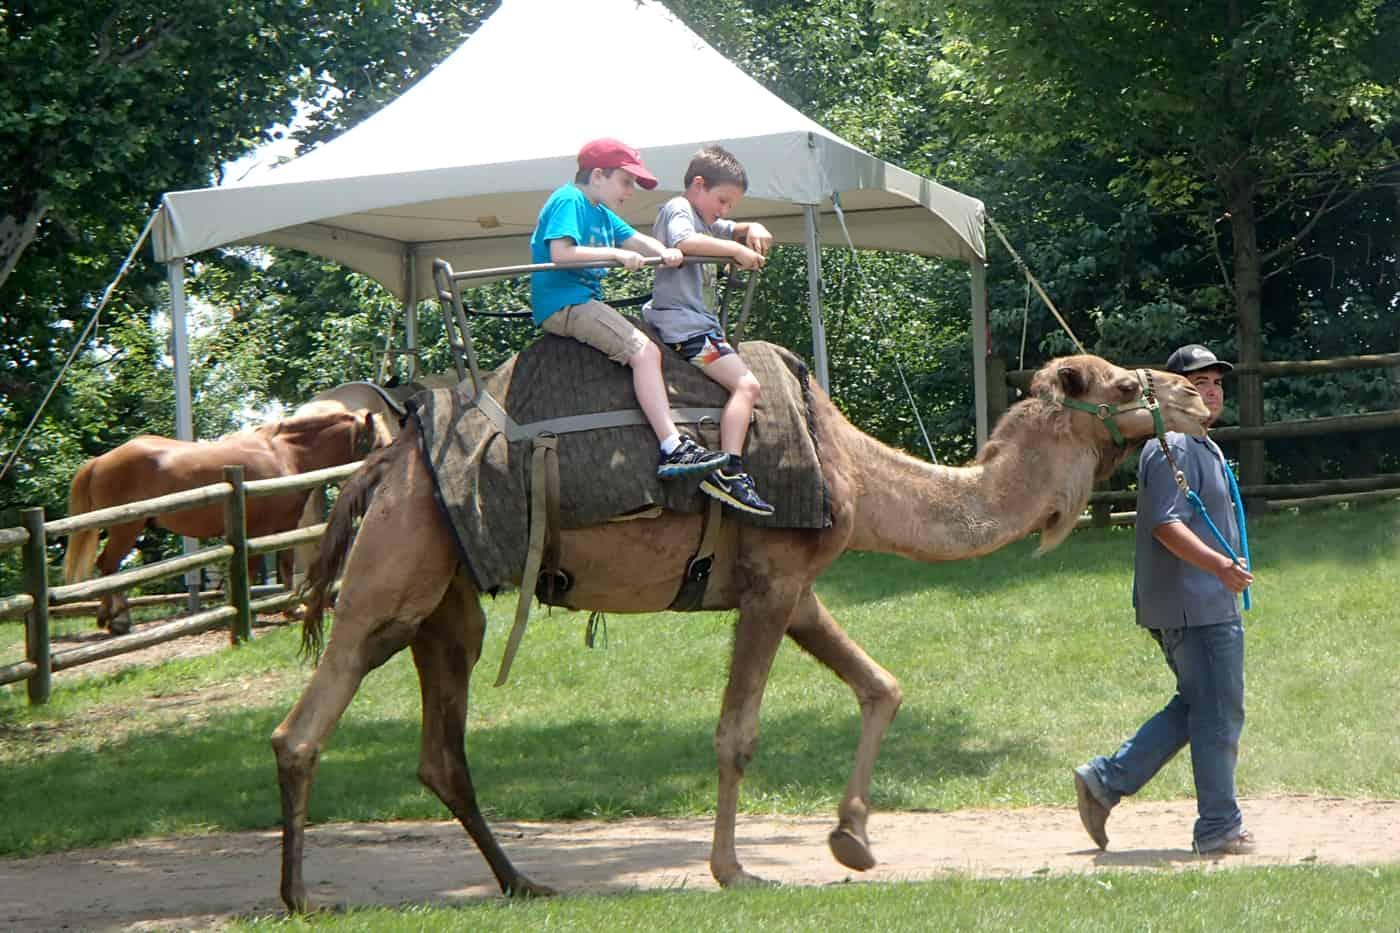 kids on camel ride at Grants Farm